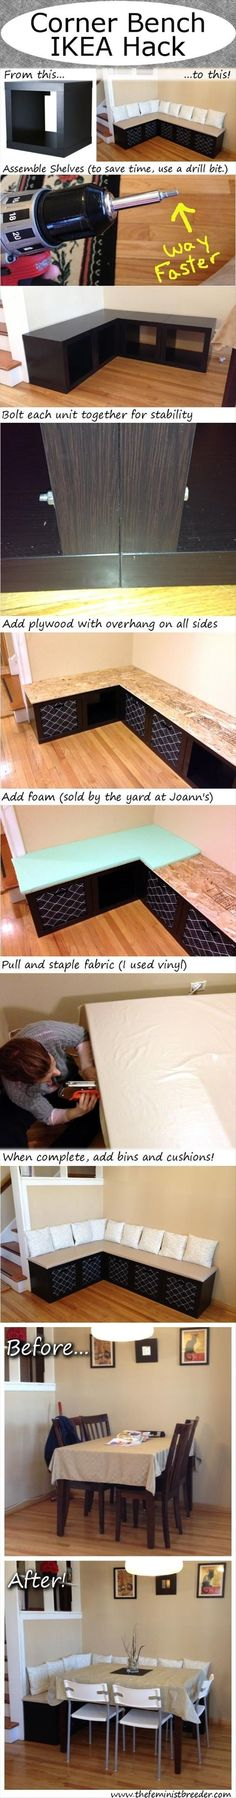 Sofá rinconera con muebles Ikea